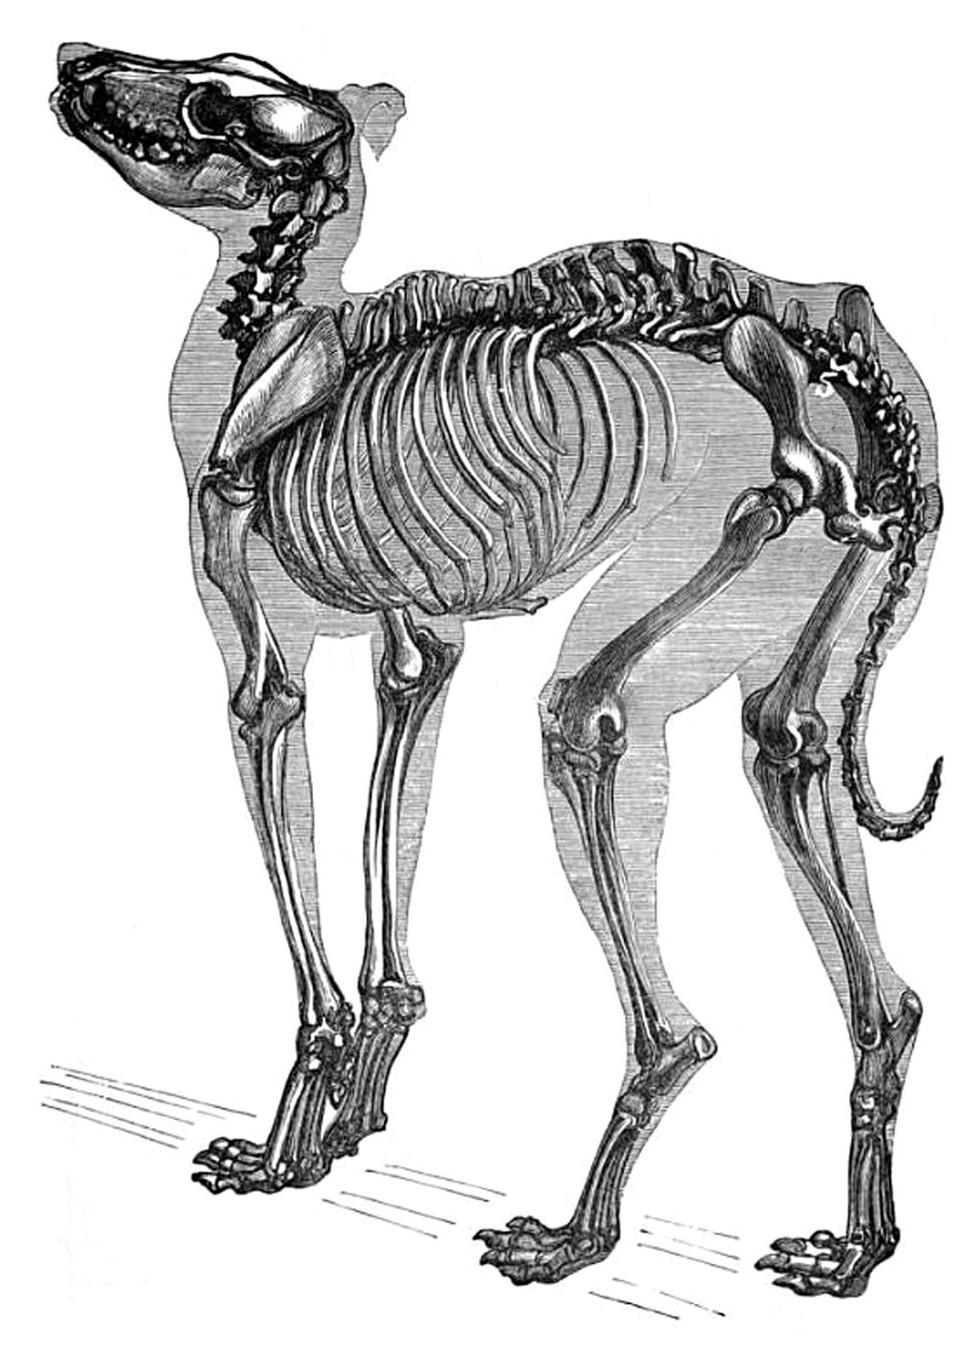 Canine neuromuscular degeneration